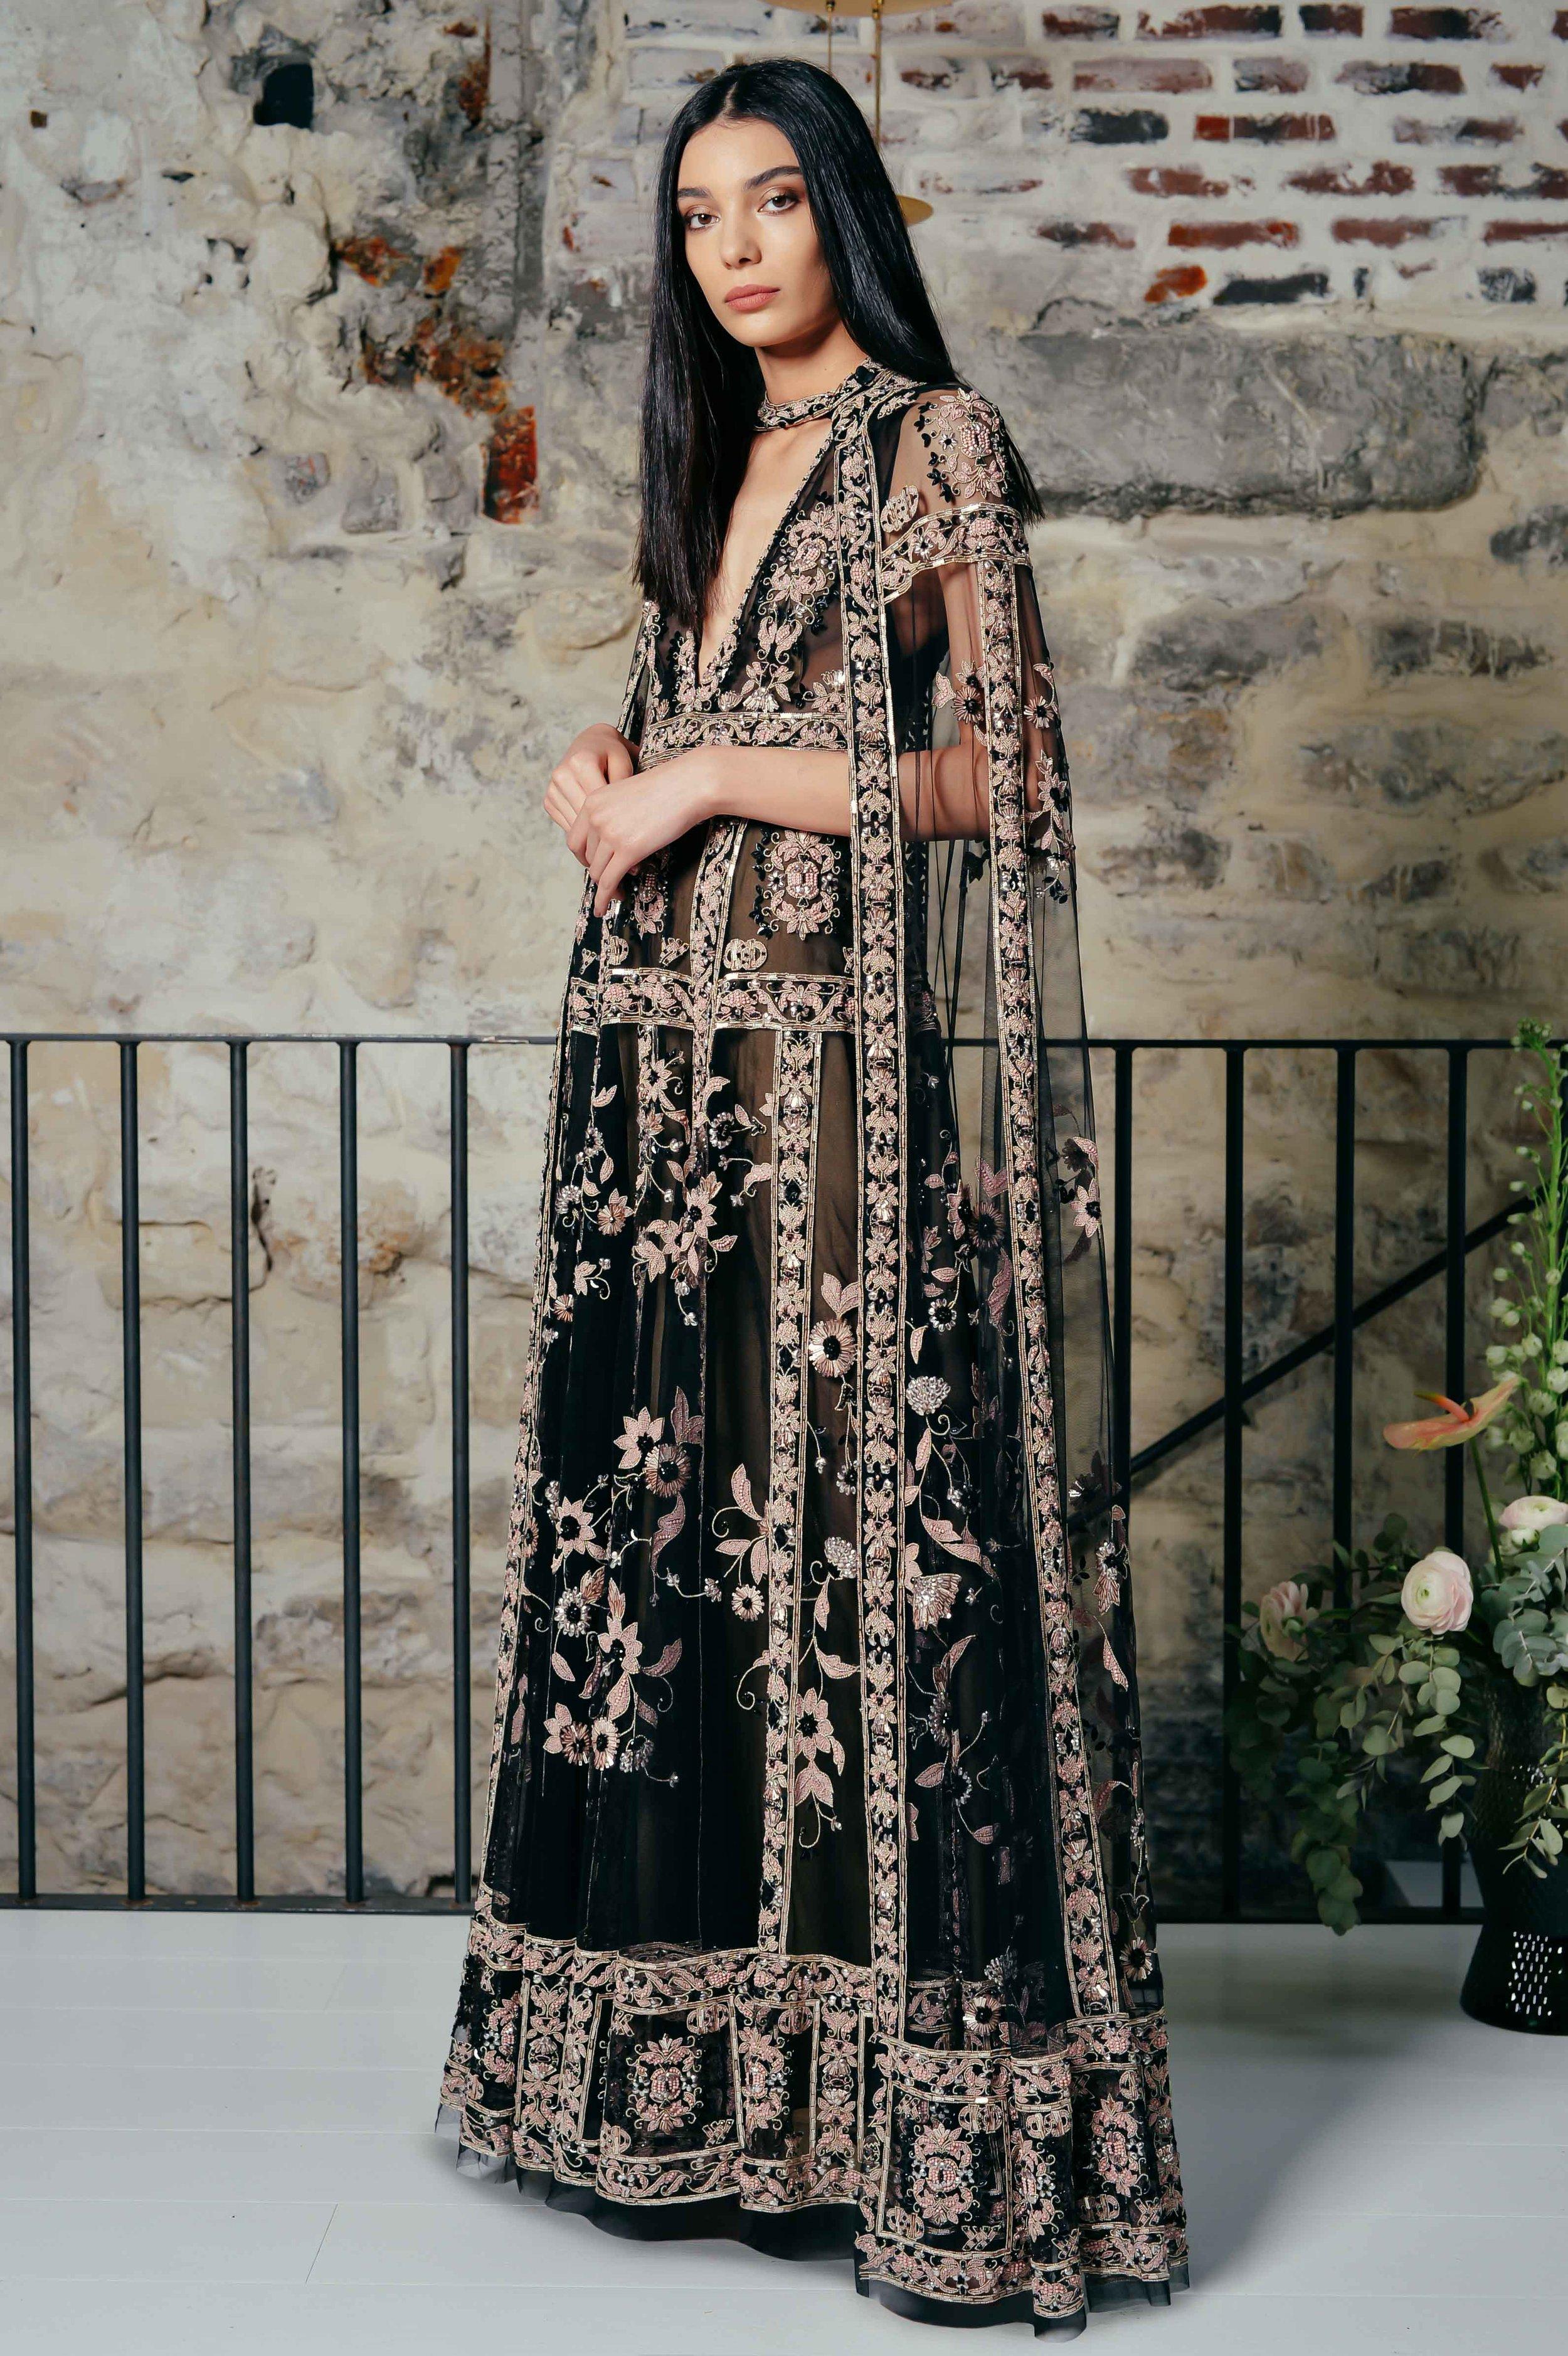 SACRED GEOMETRY CAPE + DRESS